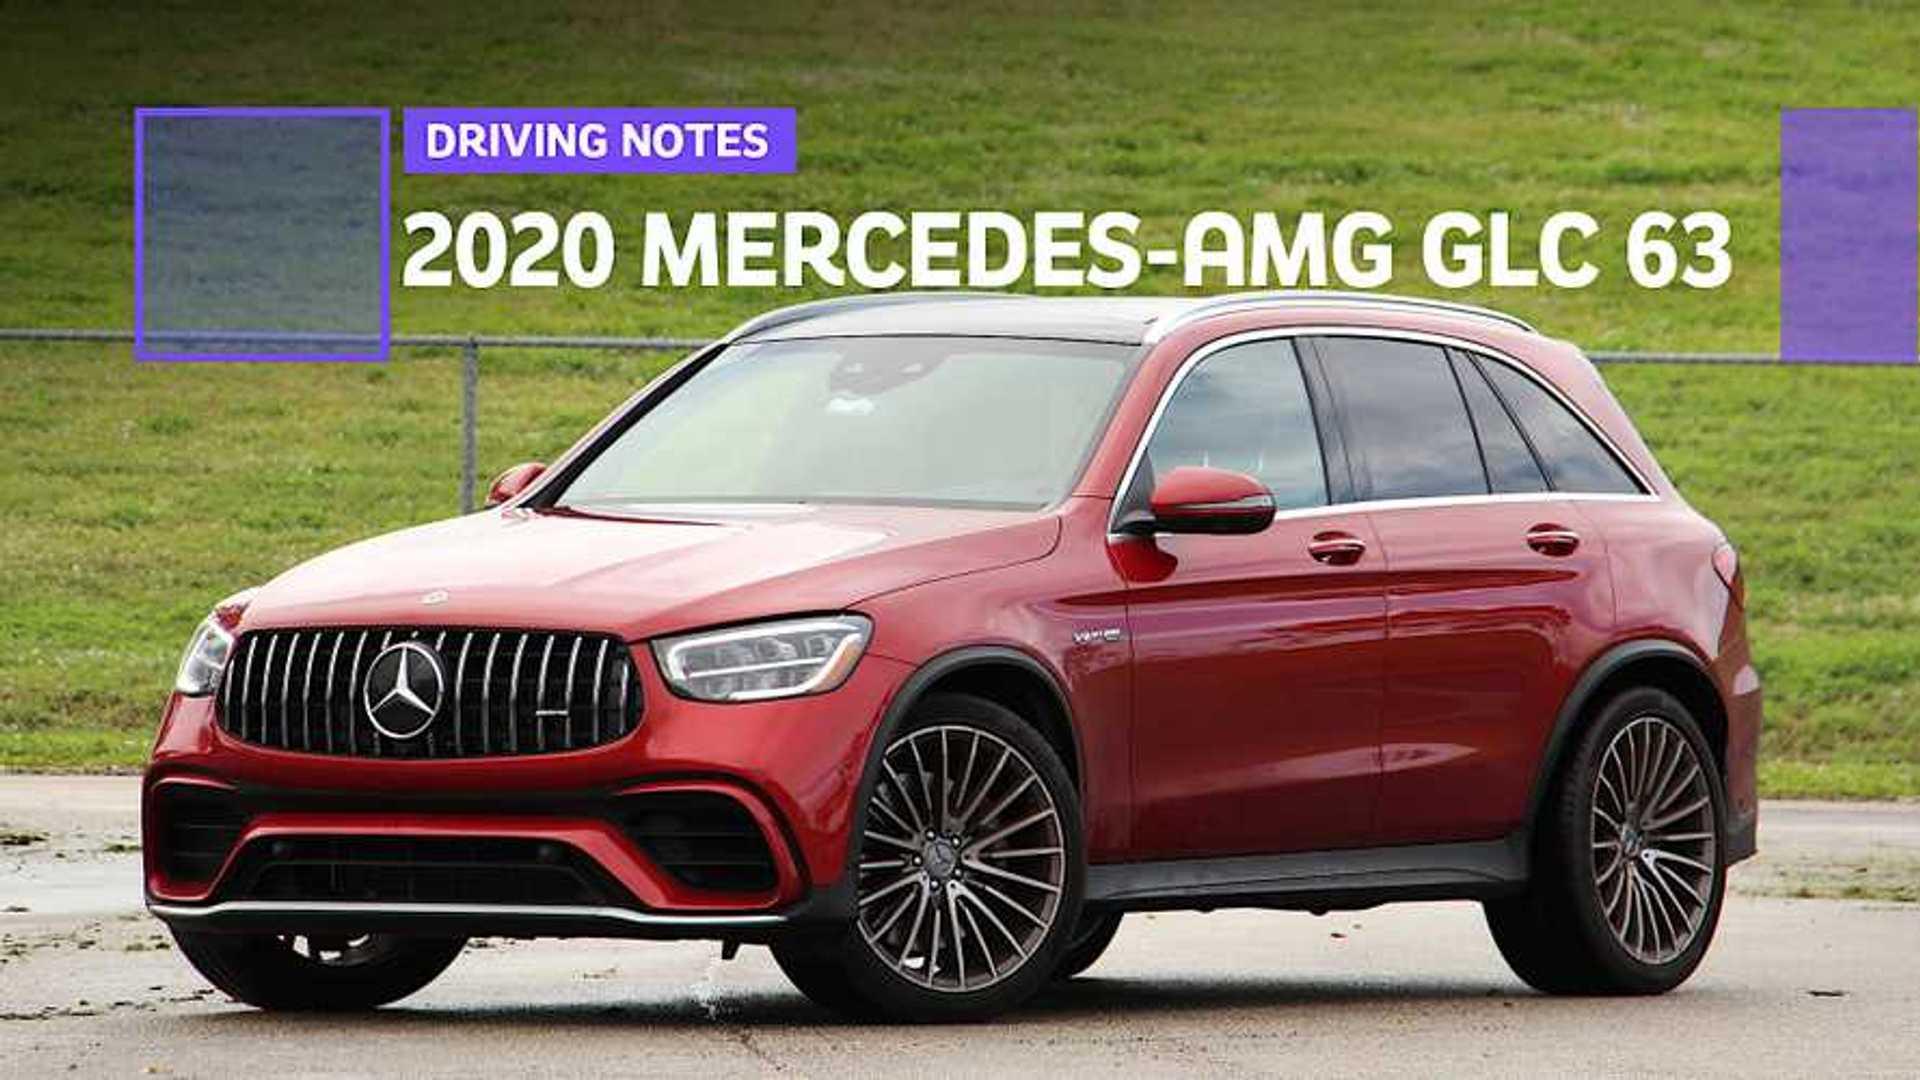 2020 Mercedes Amg Glc 63 Driving Notes Insane Uv